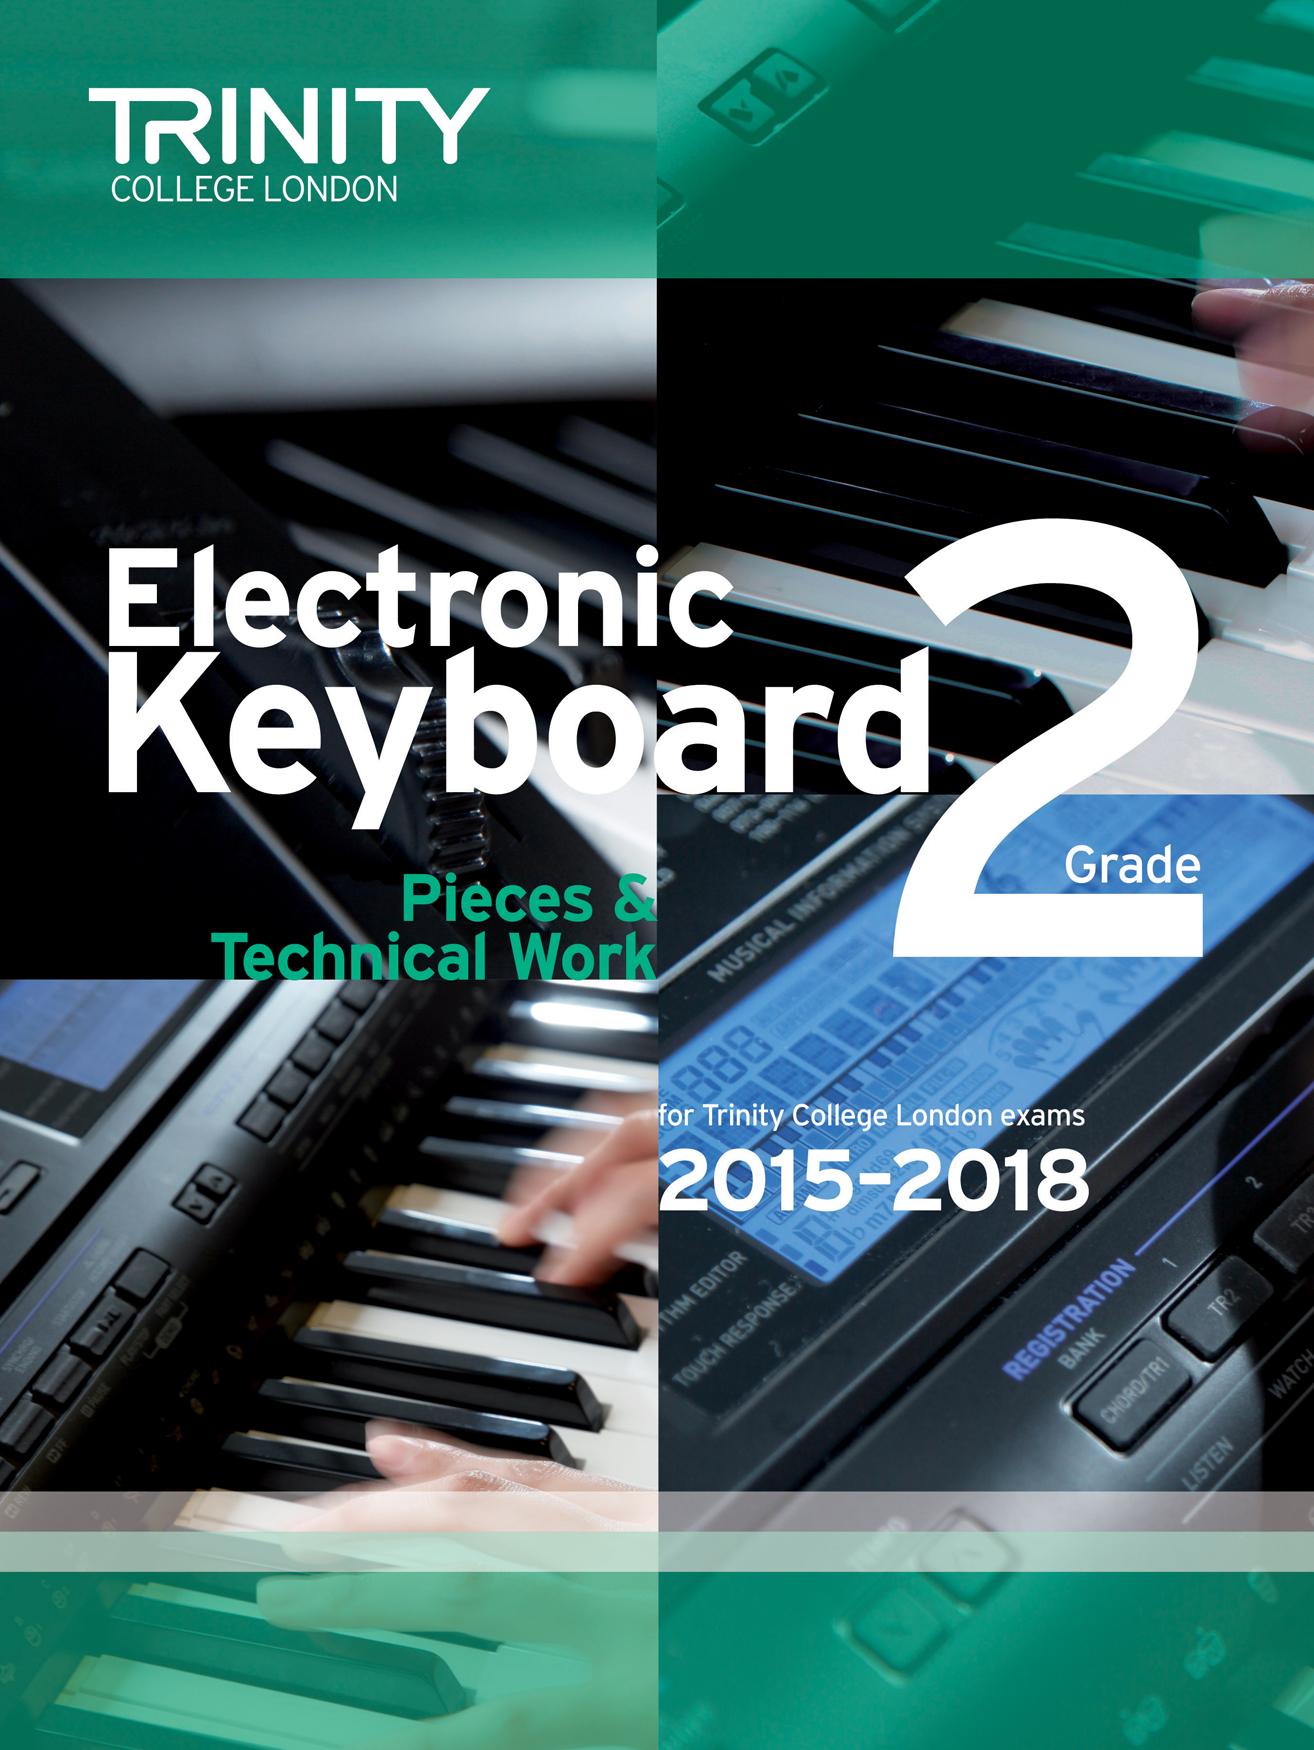 Electronic Keyboard Grade 2 2015-2018: Electric Keyboard